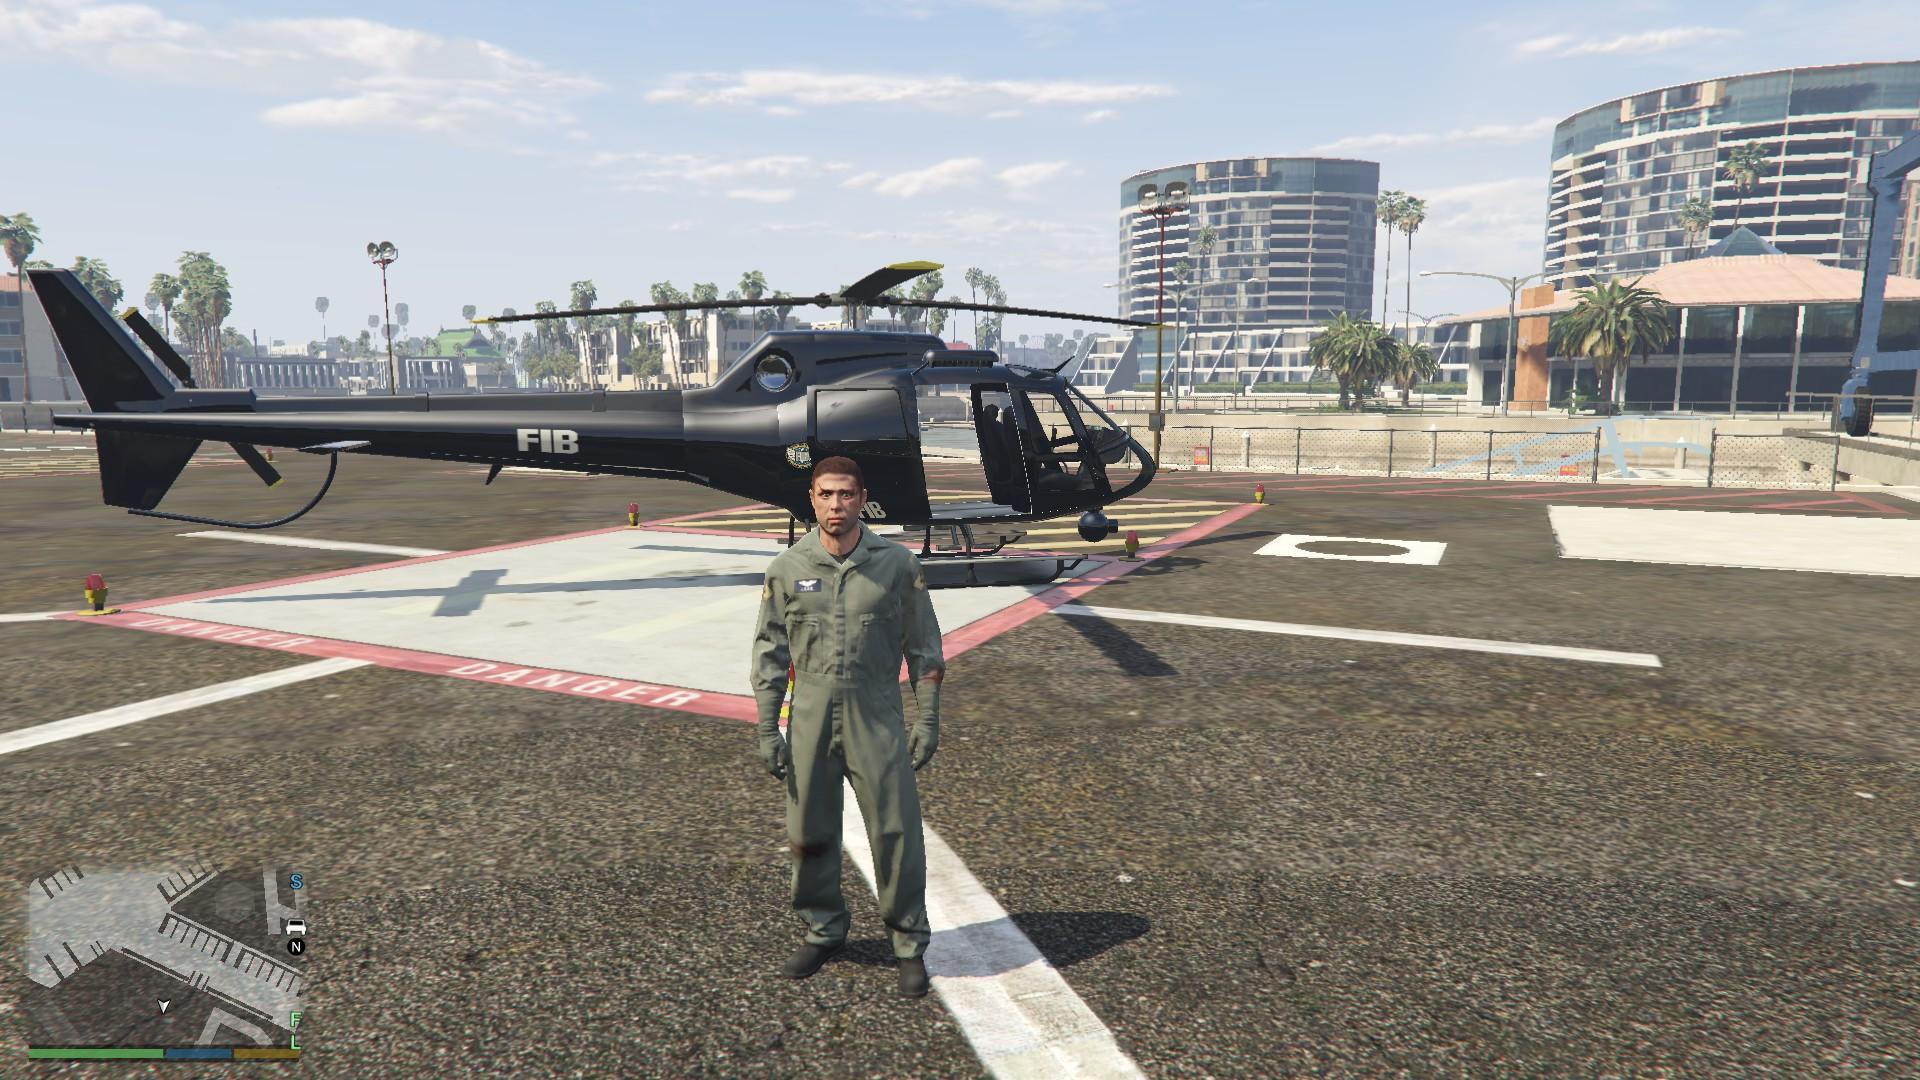 Elicottero Gta 5 : Fib police helicopter gta mods